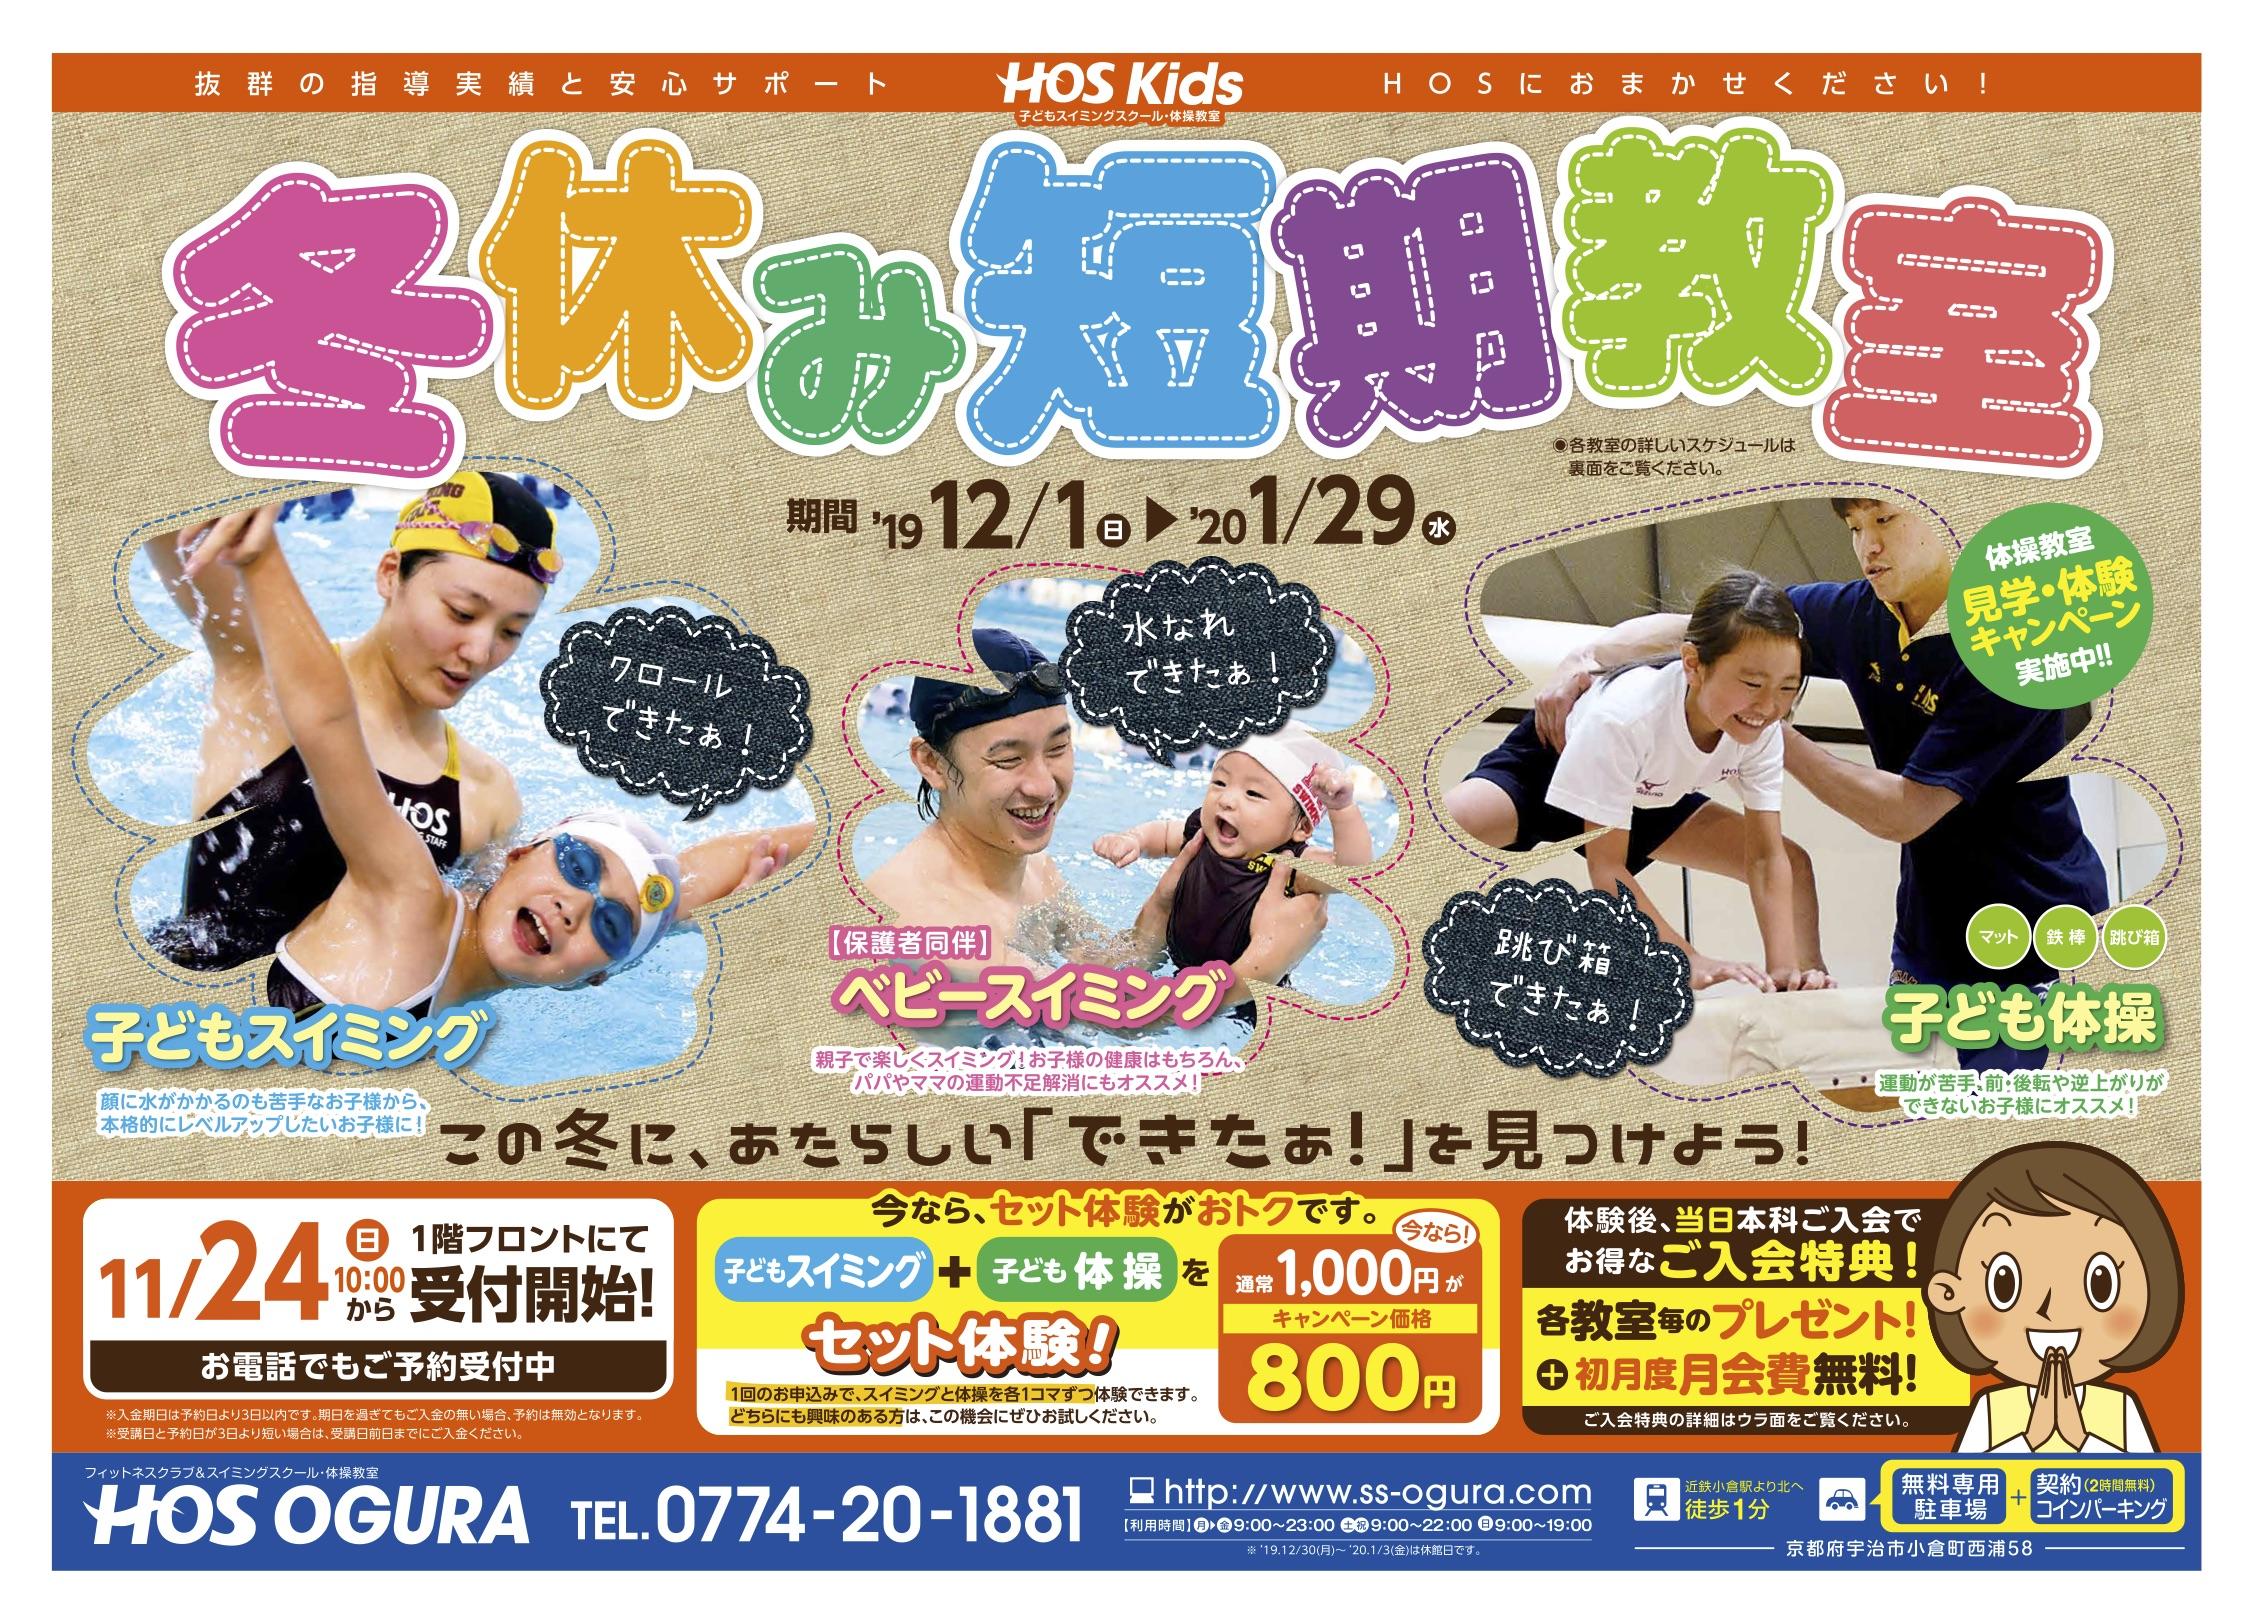 ogura-201911-tanki-01